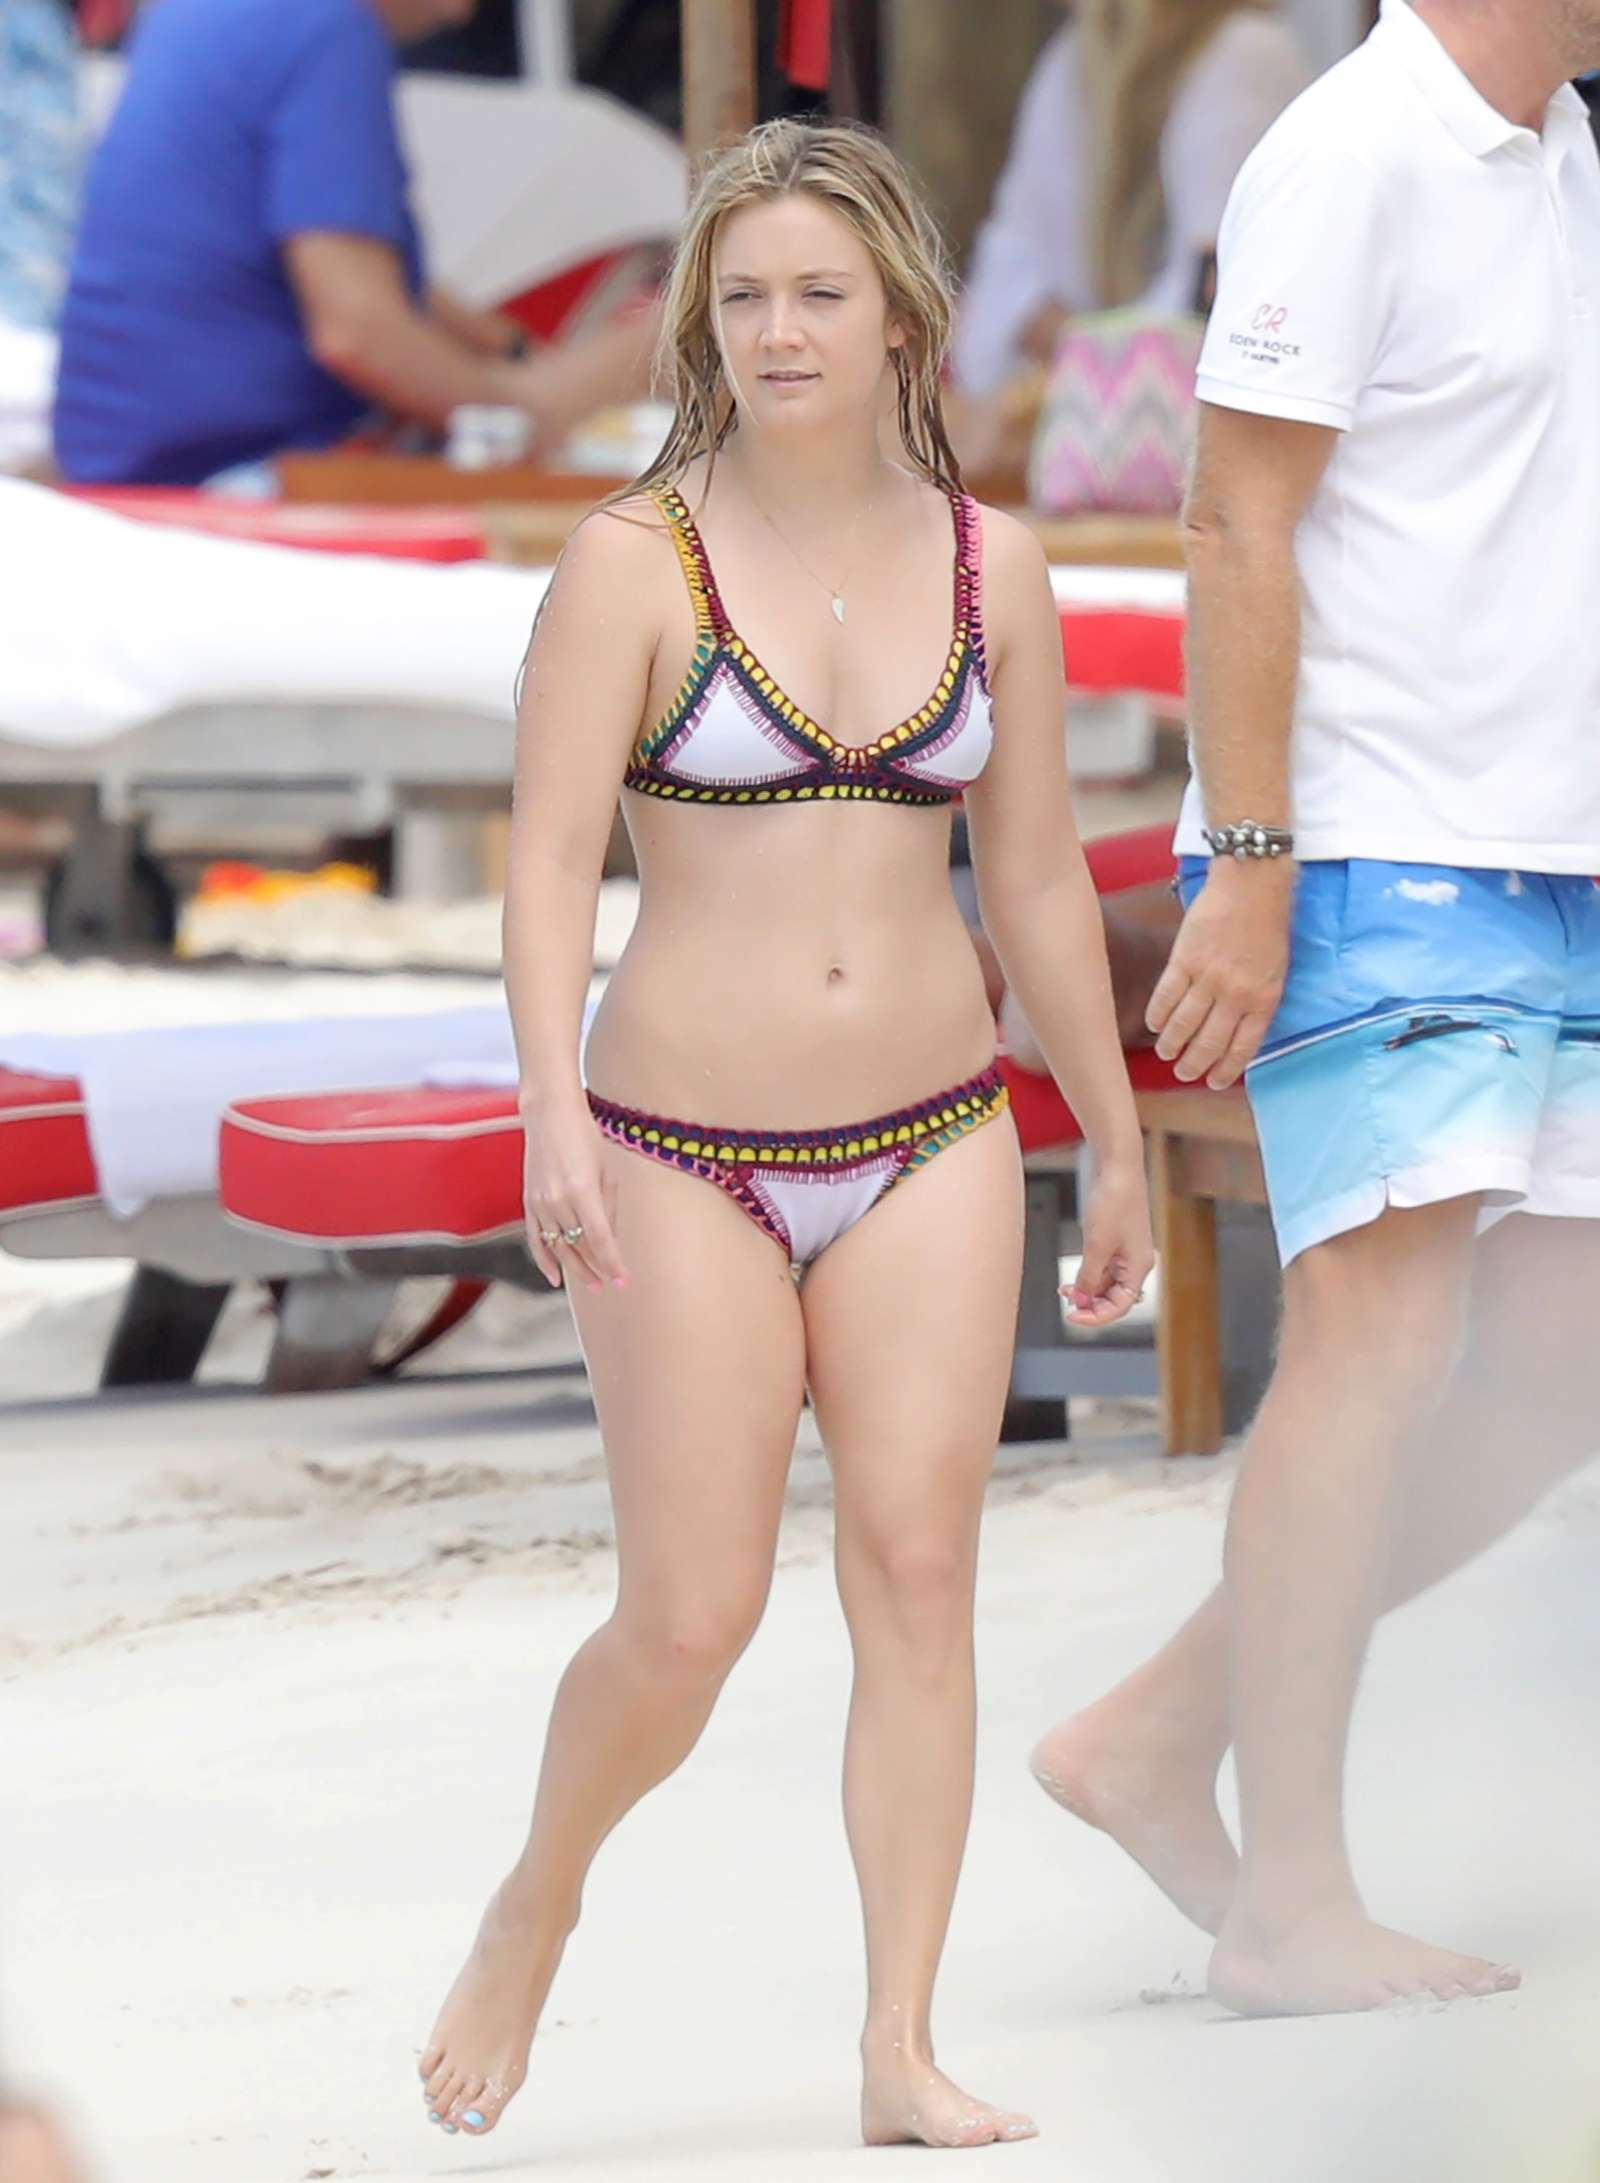 Andie macdowell bikini